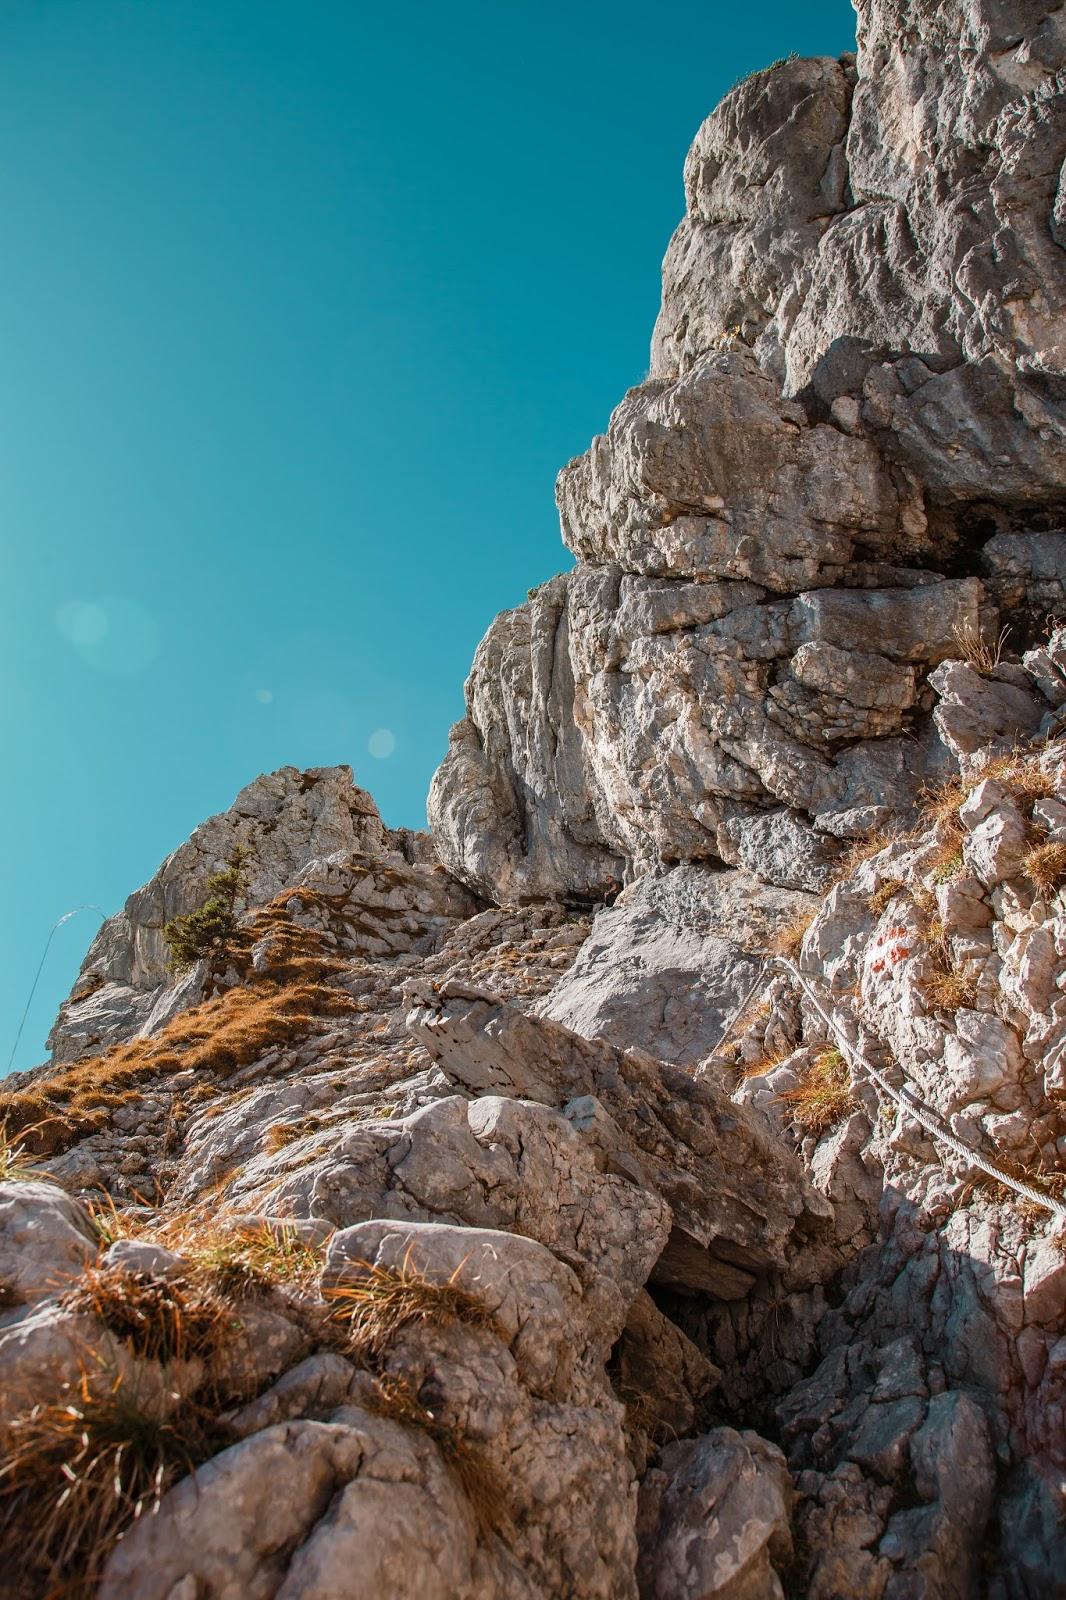 Bergtour Scheffauer  Wandern Wilder Kaiser  leichter Gipfel im Wilden Kaiser  Wandern-Tirol 05